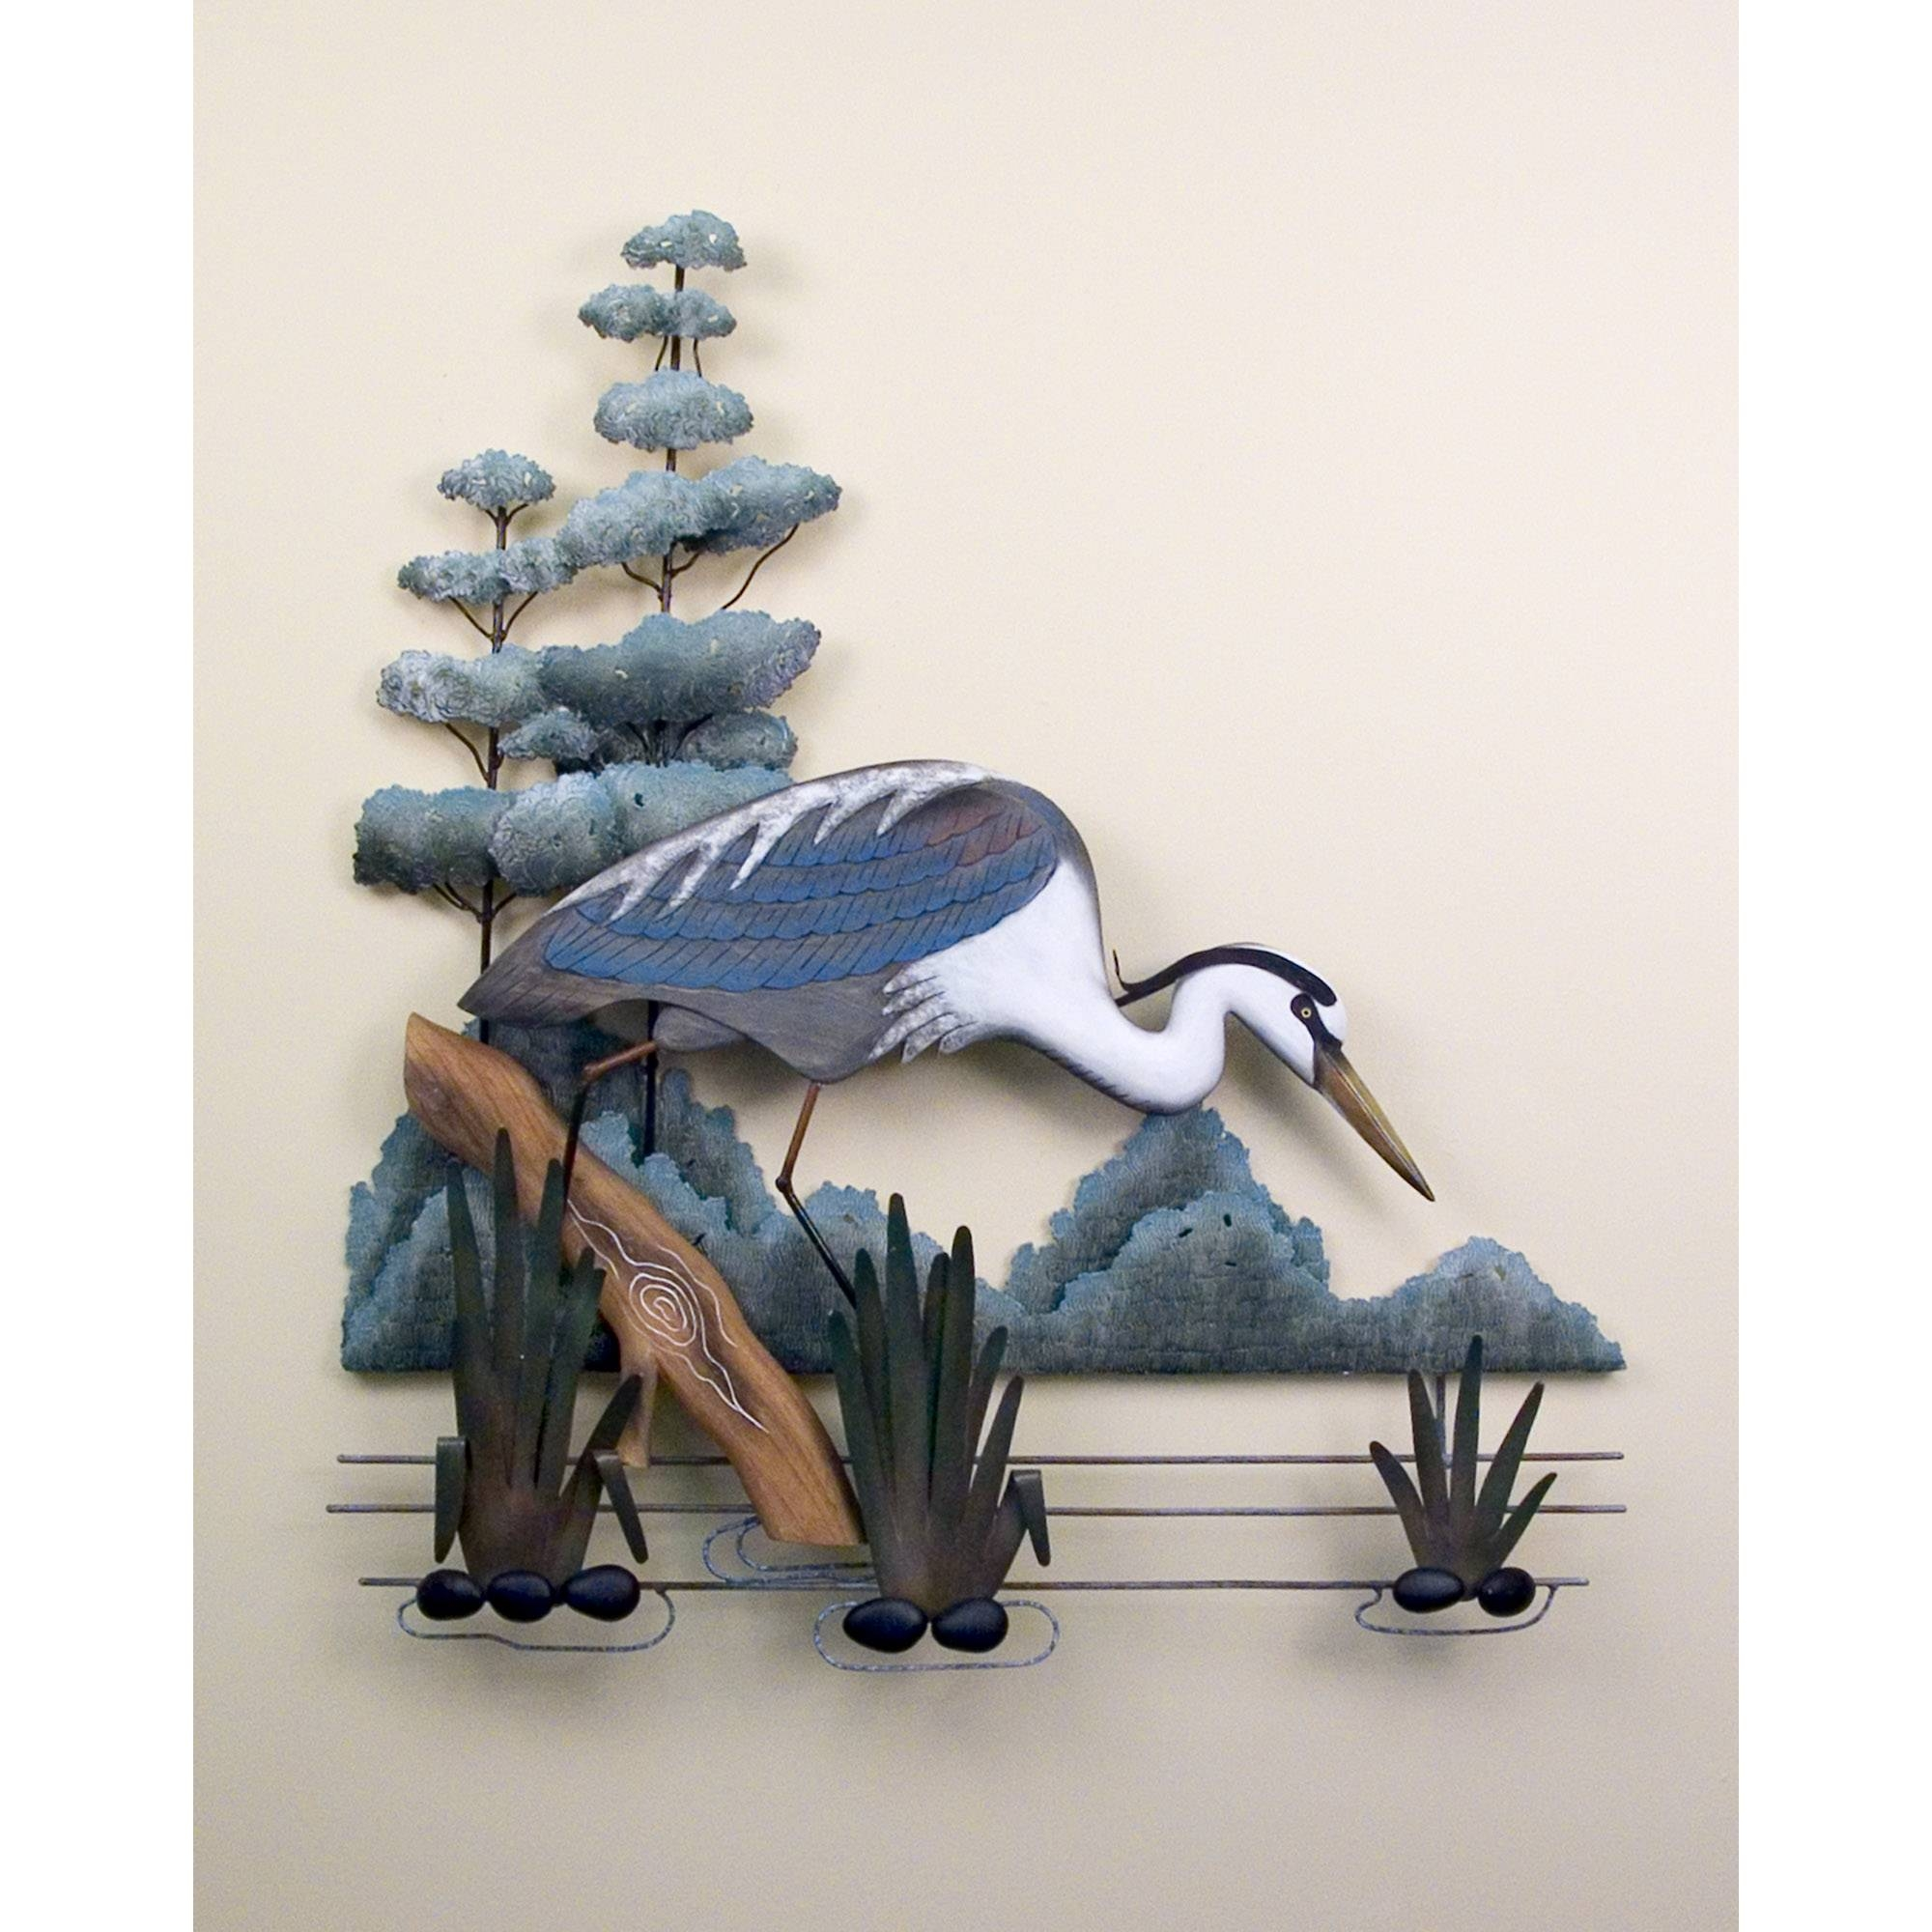 Stalking, Great Blue Heron, Wall Art, Birds, Shore, Tropical Regarding Current Heron Metal Wall Art (View 4 of 20)